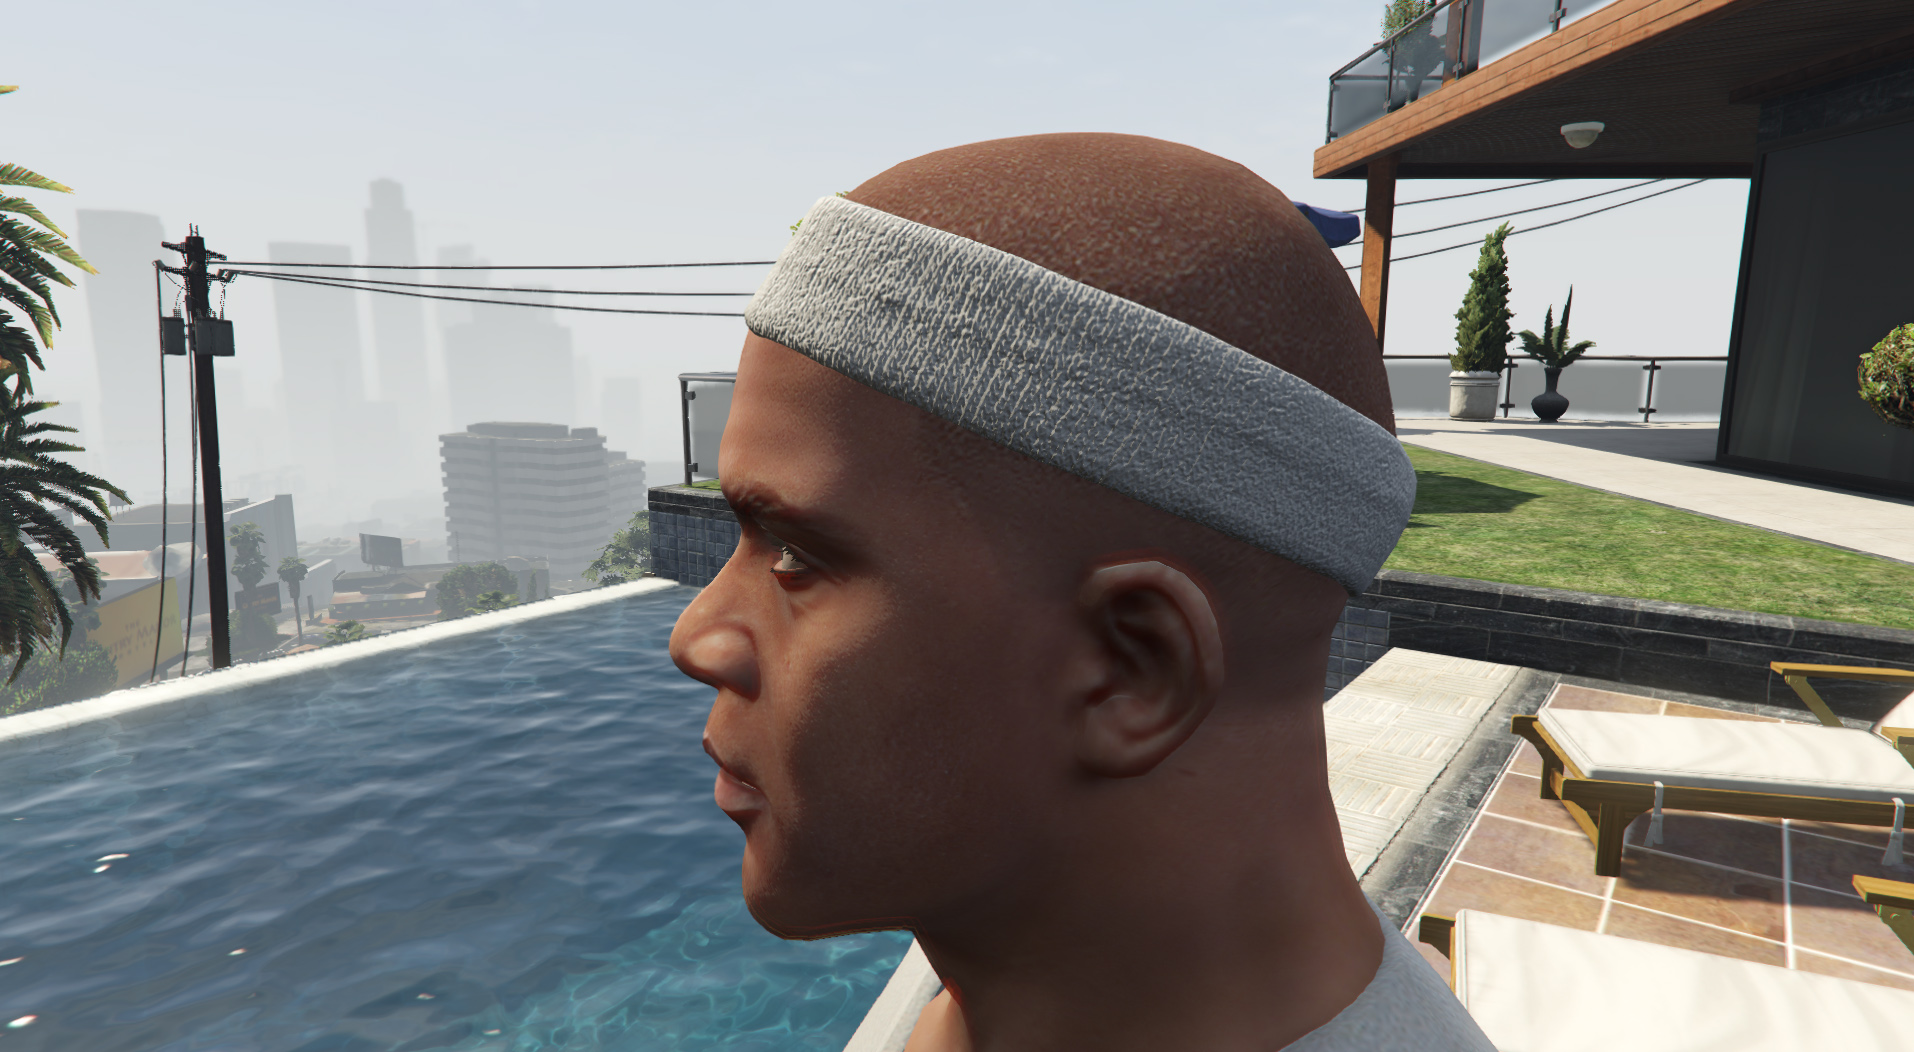 0_1507172077896_headband.jpg